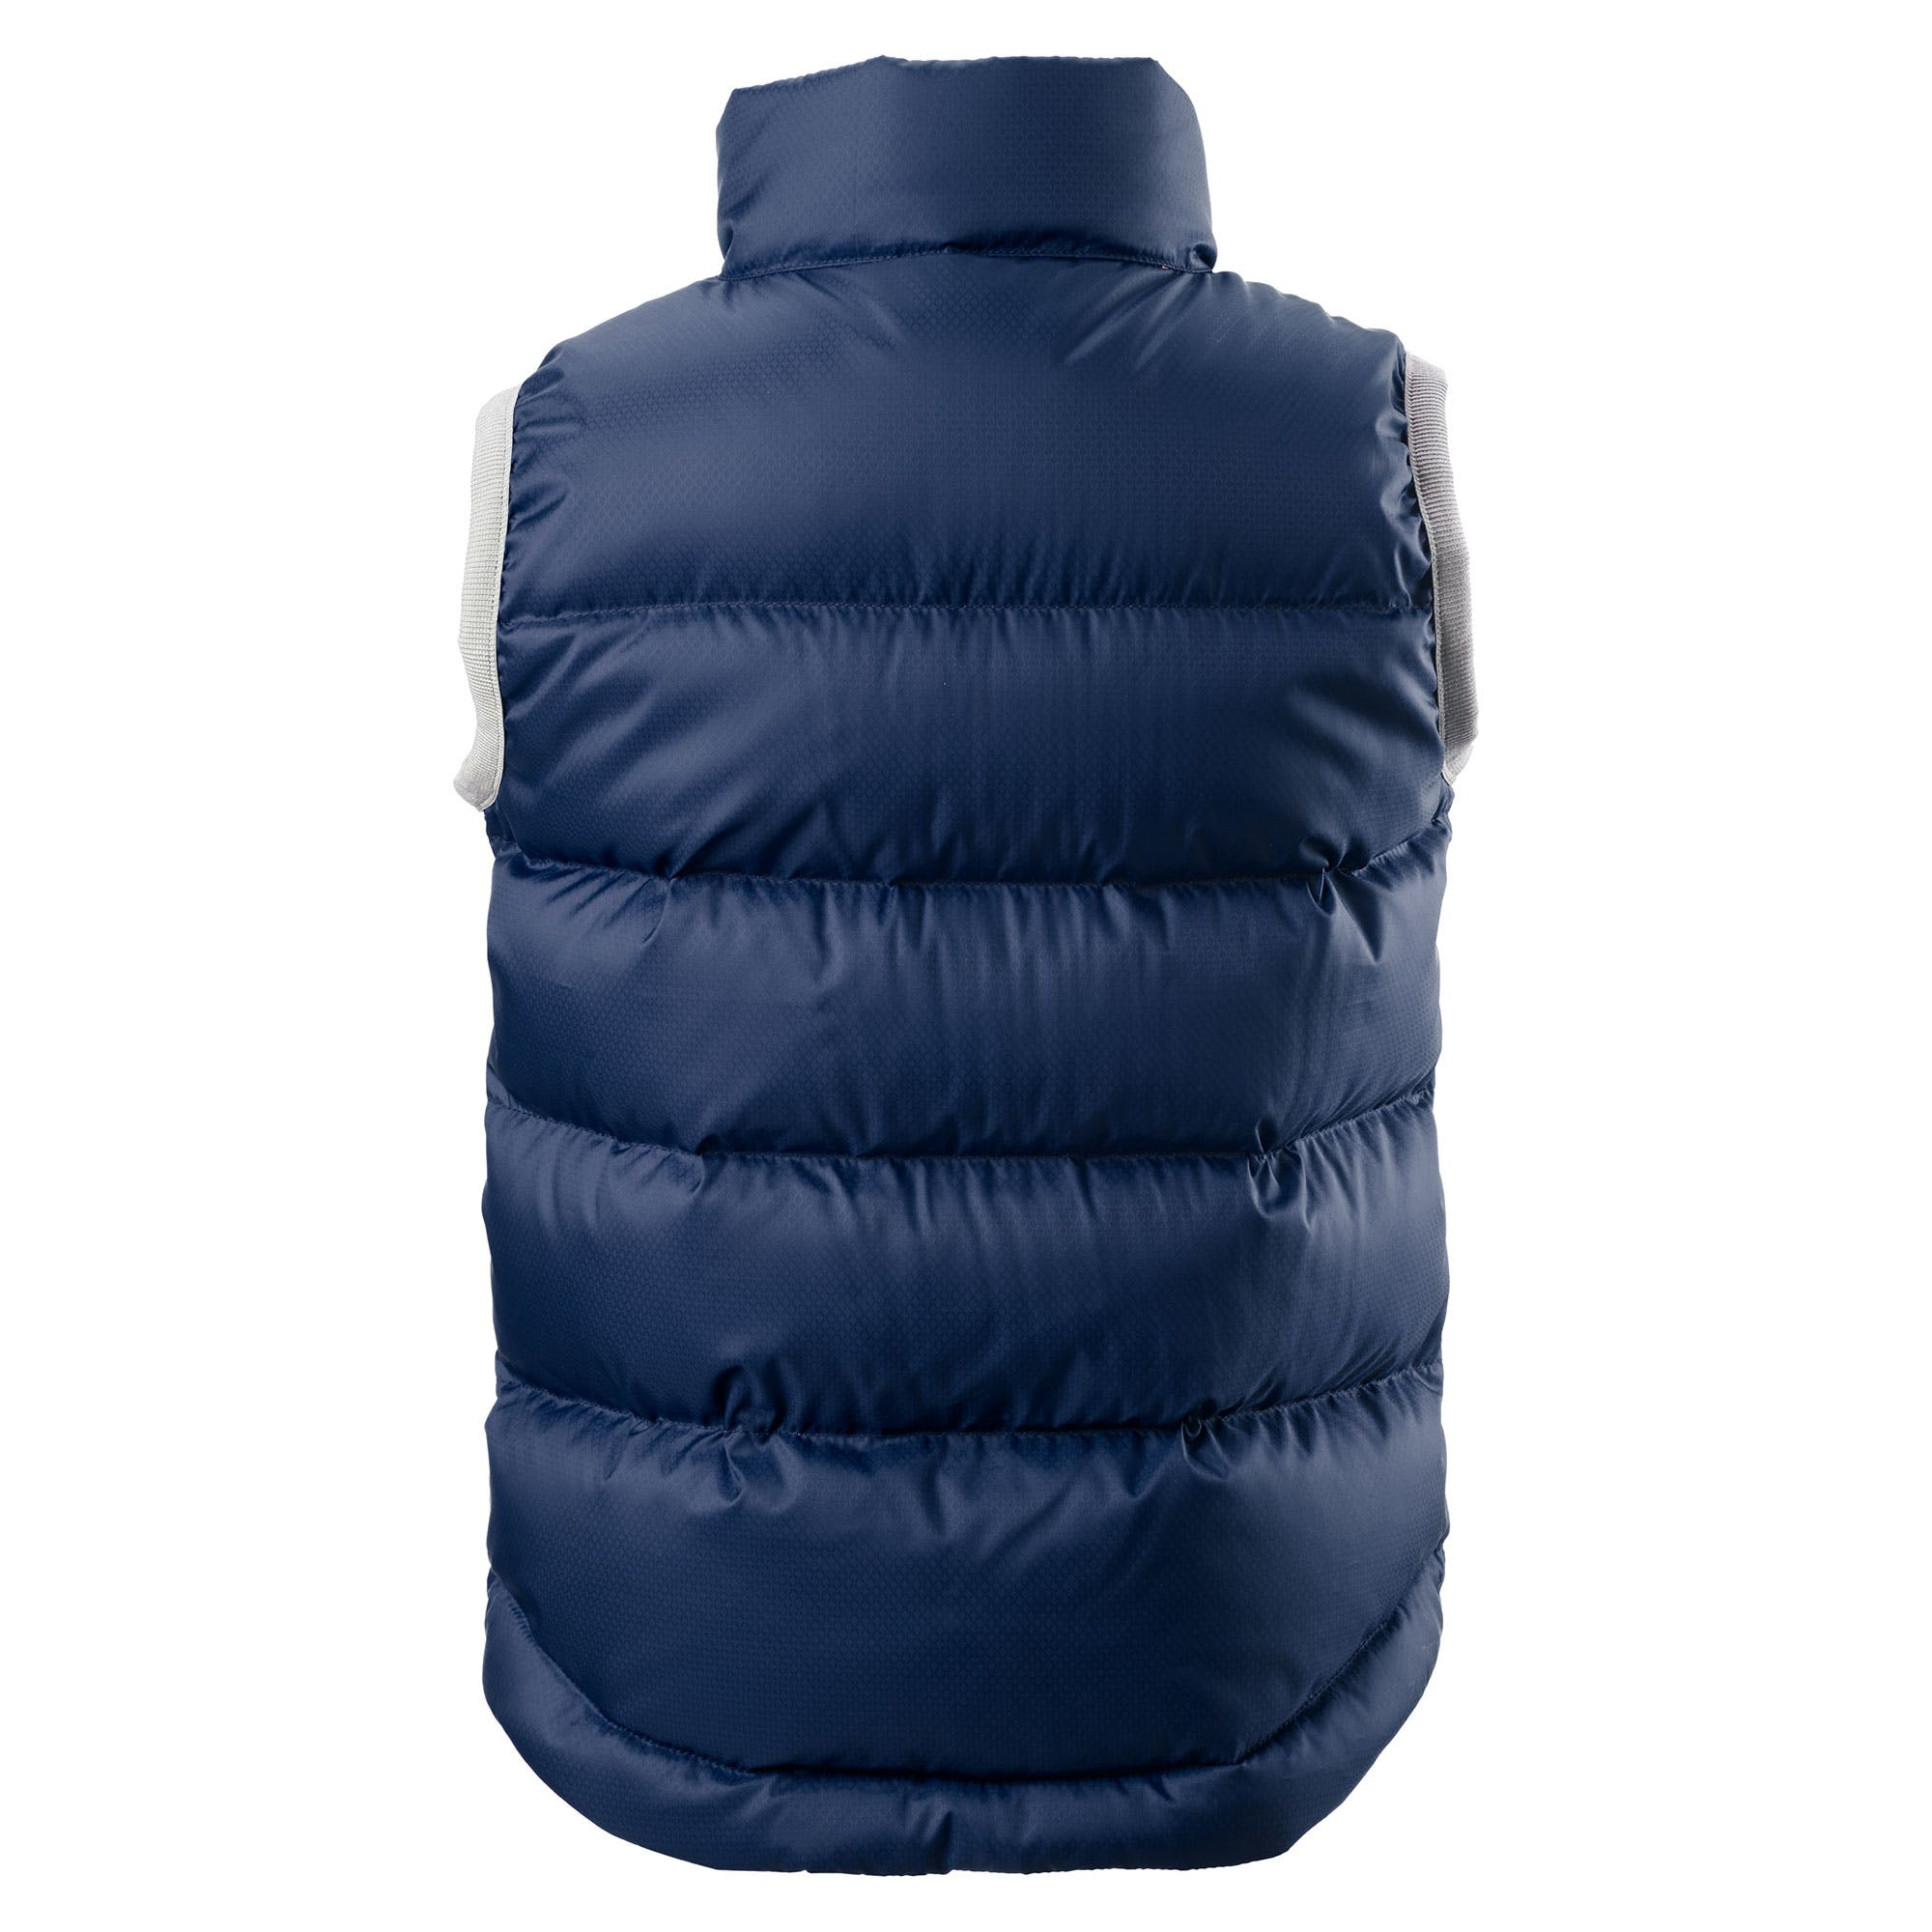 Elcho Kids' Down Vest Manufacturers, Elcho Kids' Down Vest Factory, Supply Elcho Kids' Down Vest